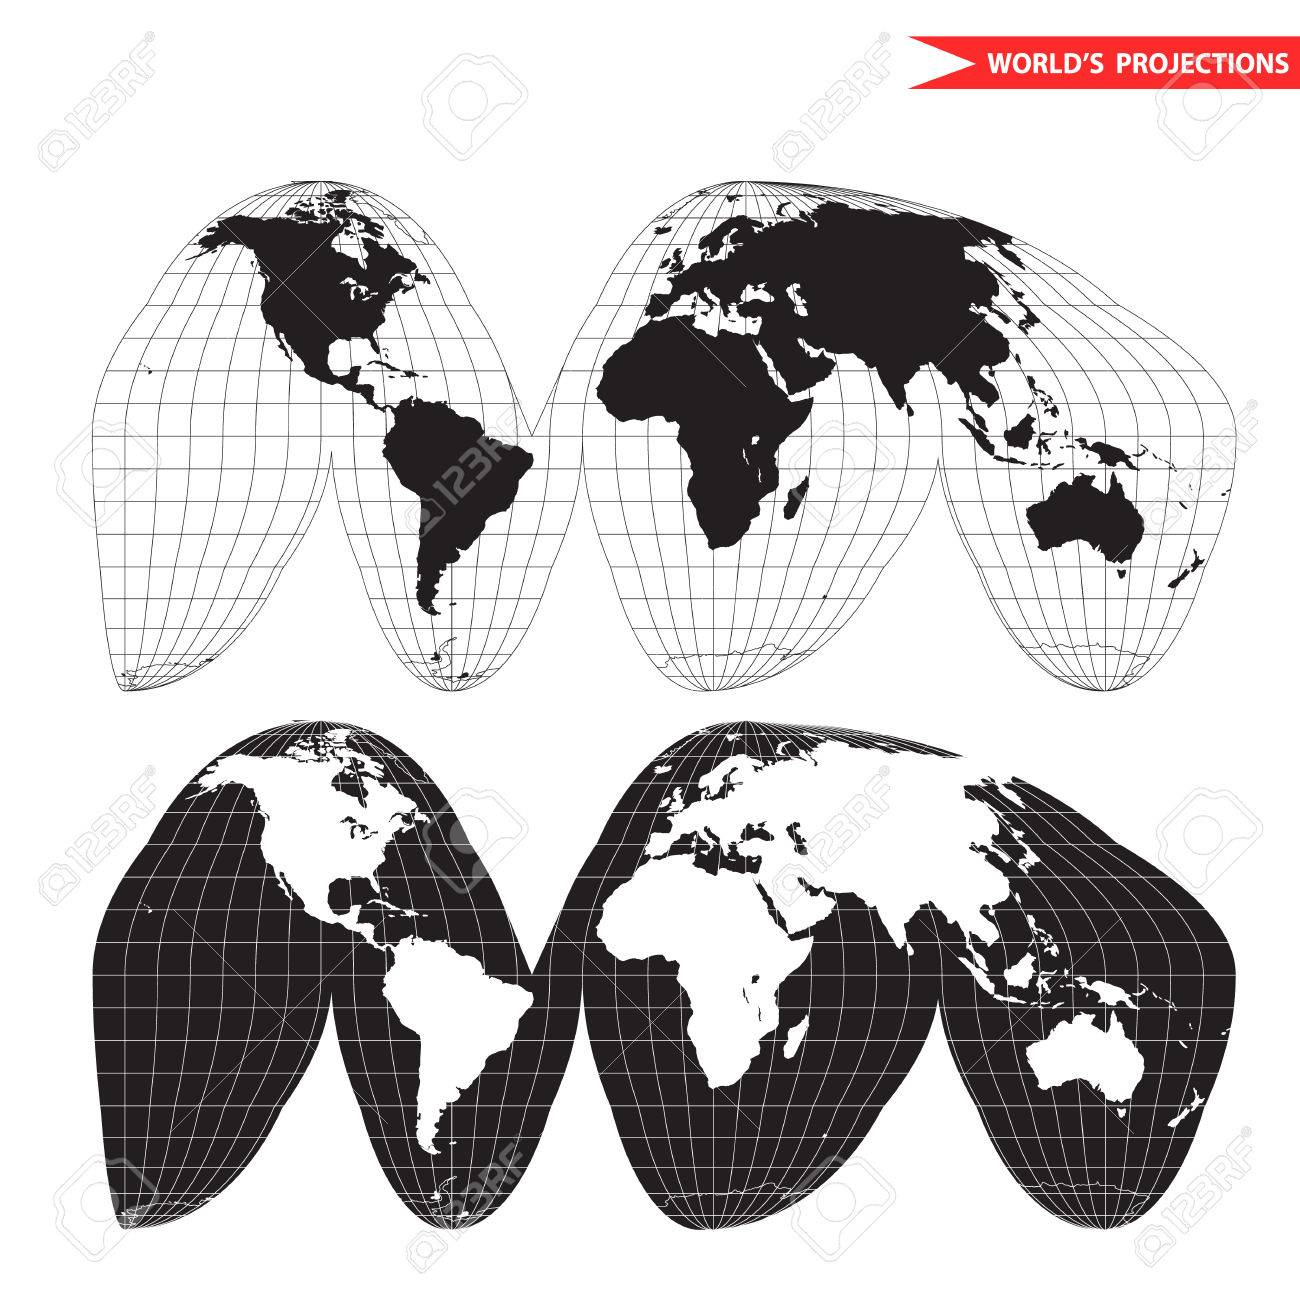 Goode homolosine projection. Orange peel world map on white background. Interrupted earth globe. - 56153134